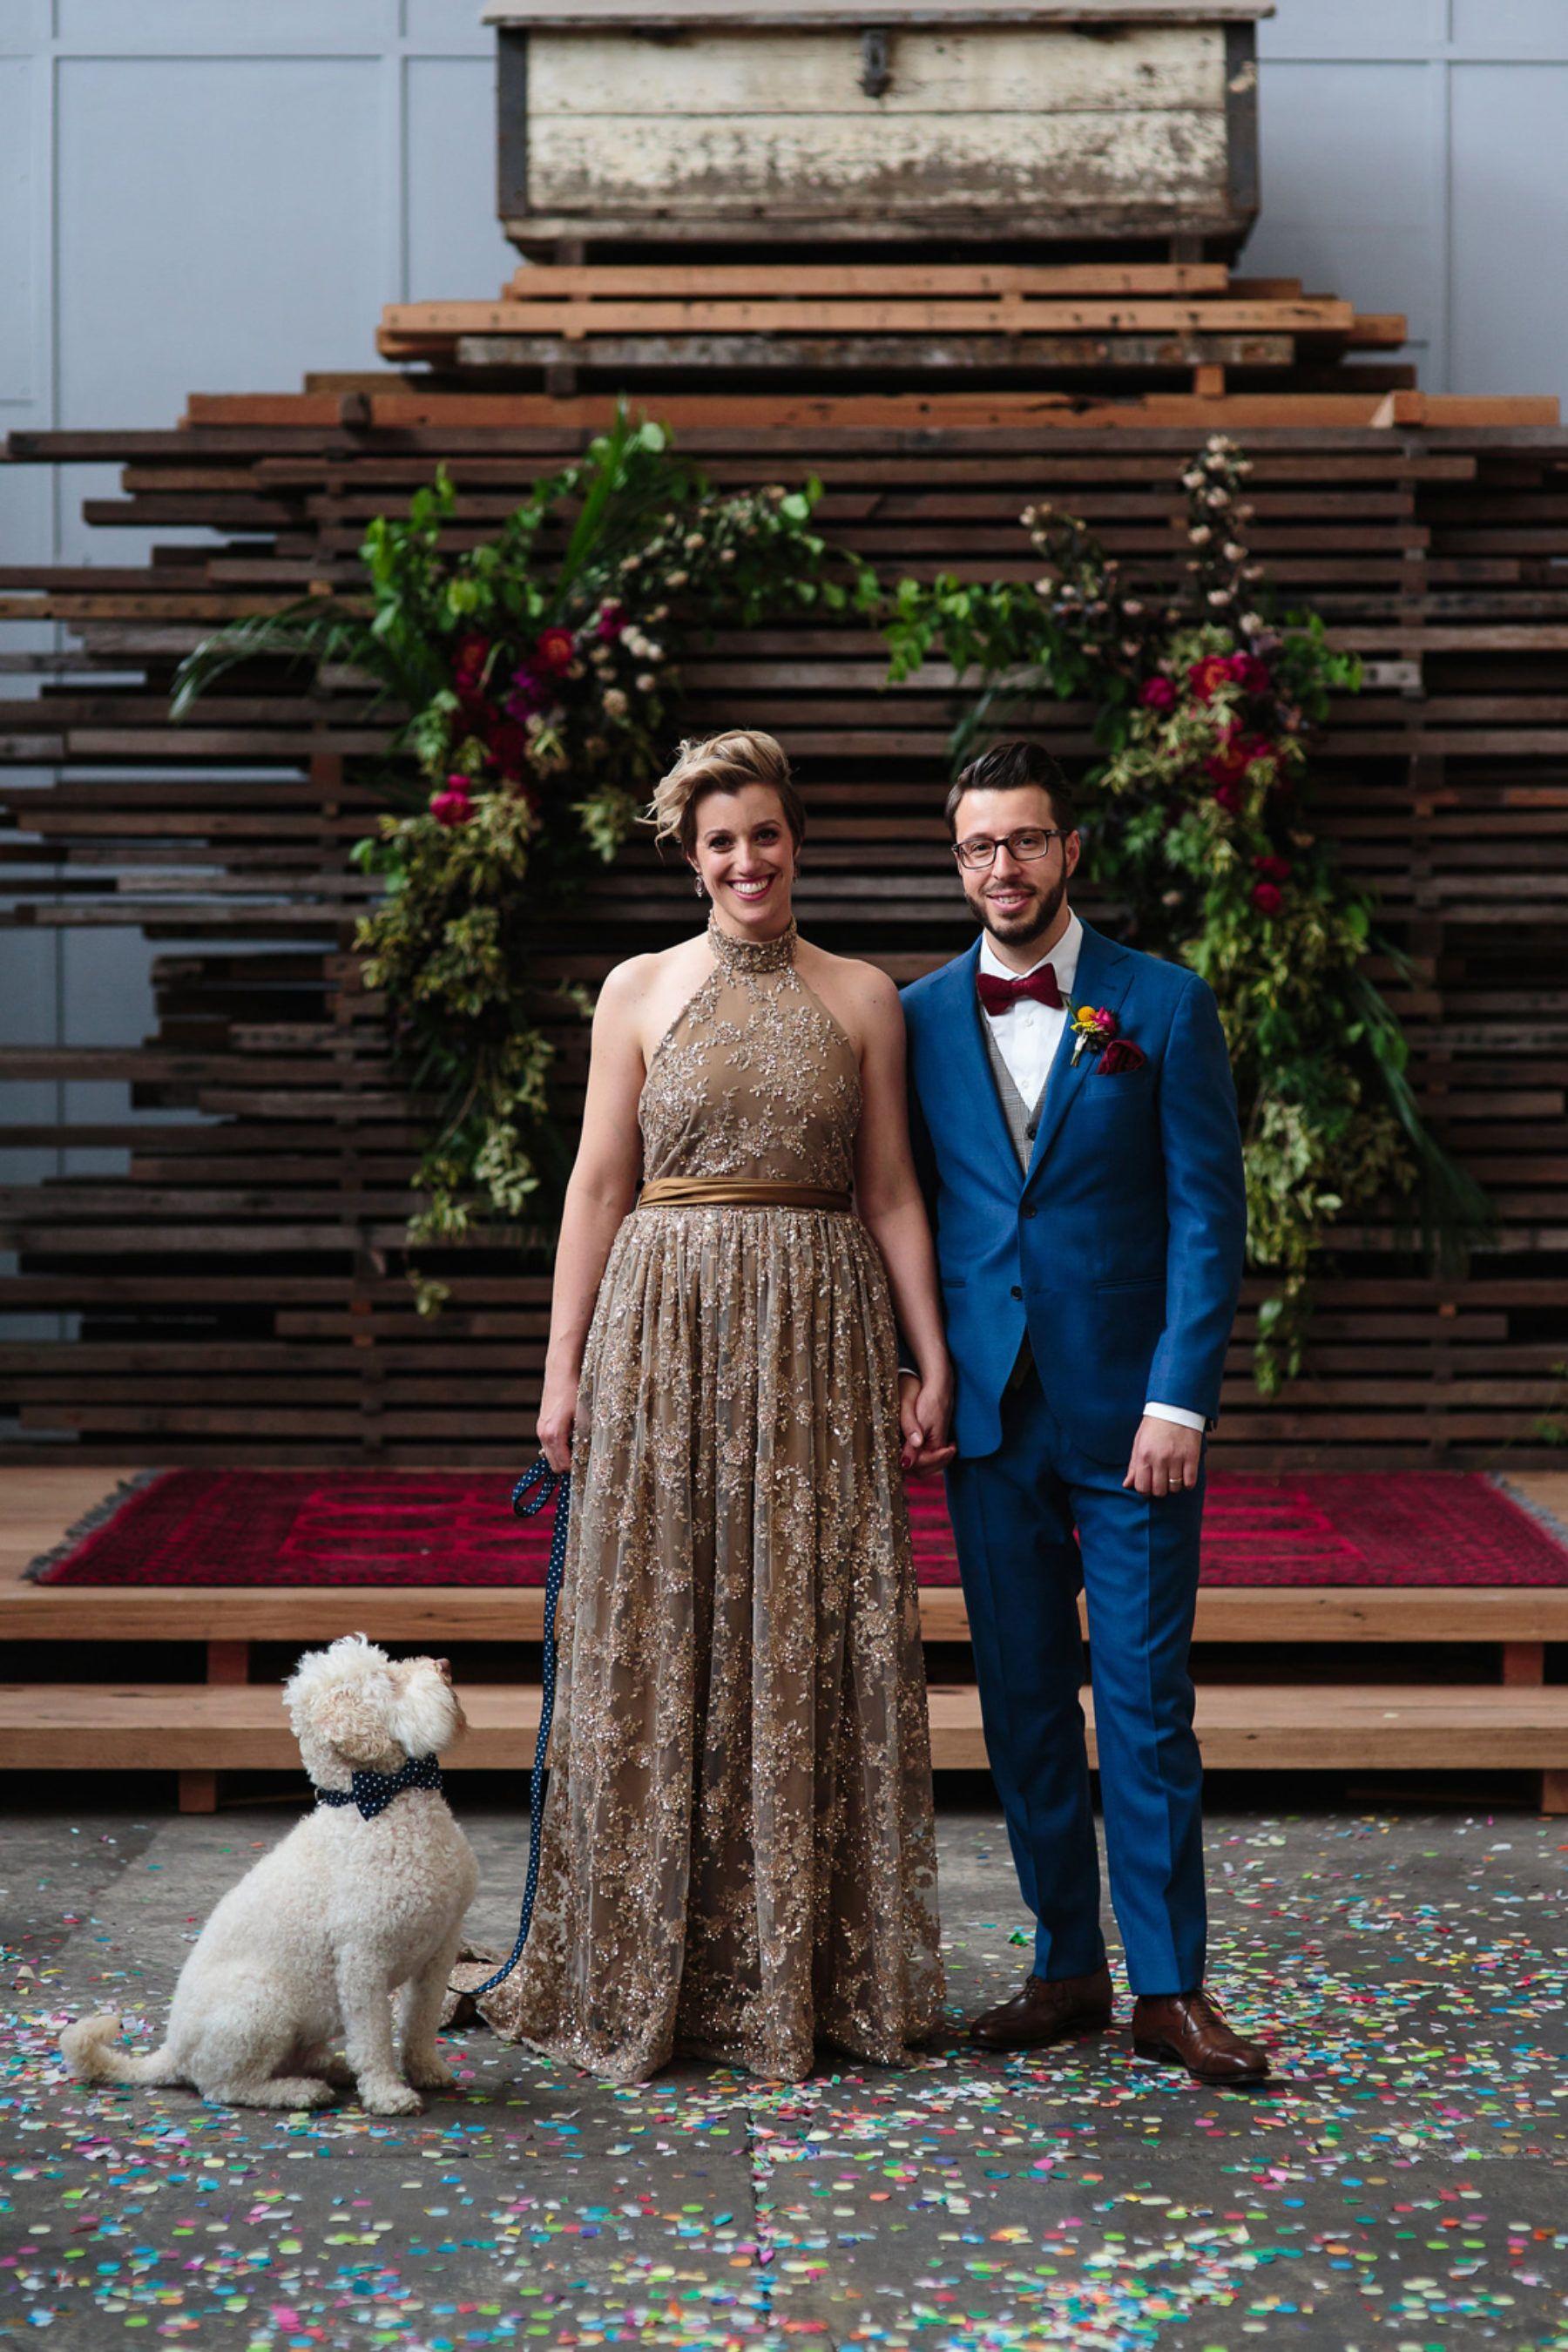 50th wedding anniversary dresses  cool bride in gold wedding dress  Bek u Paul  Pinterest  Gold